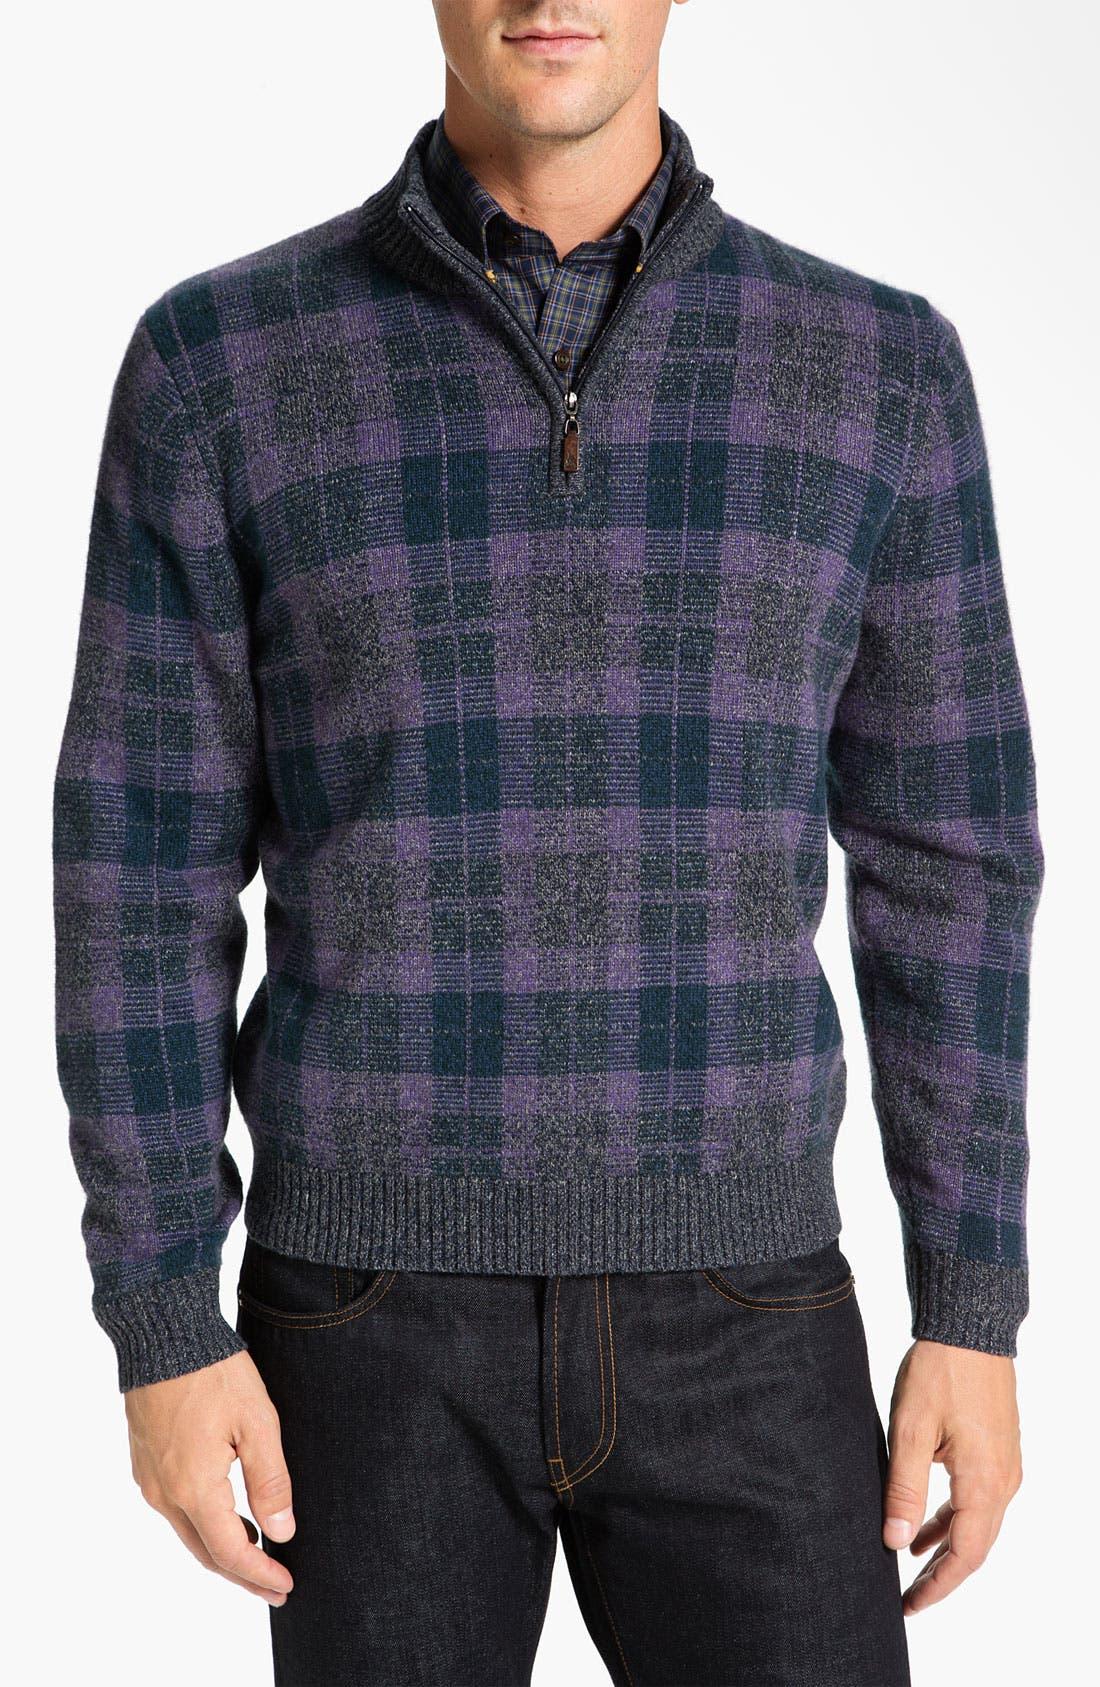 Alternate Image 1 Selected - Robert Talbott Half Zip Sweater